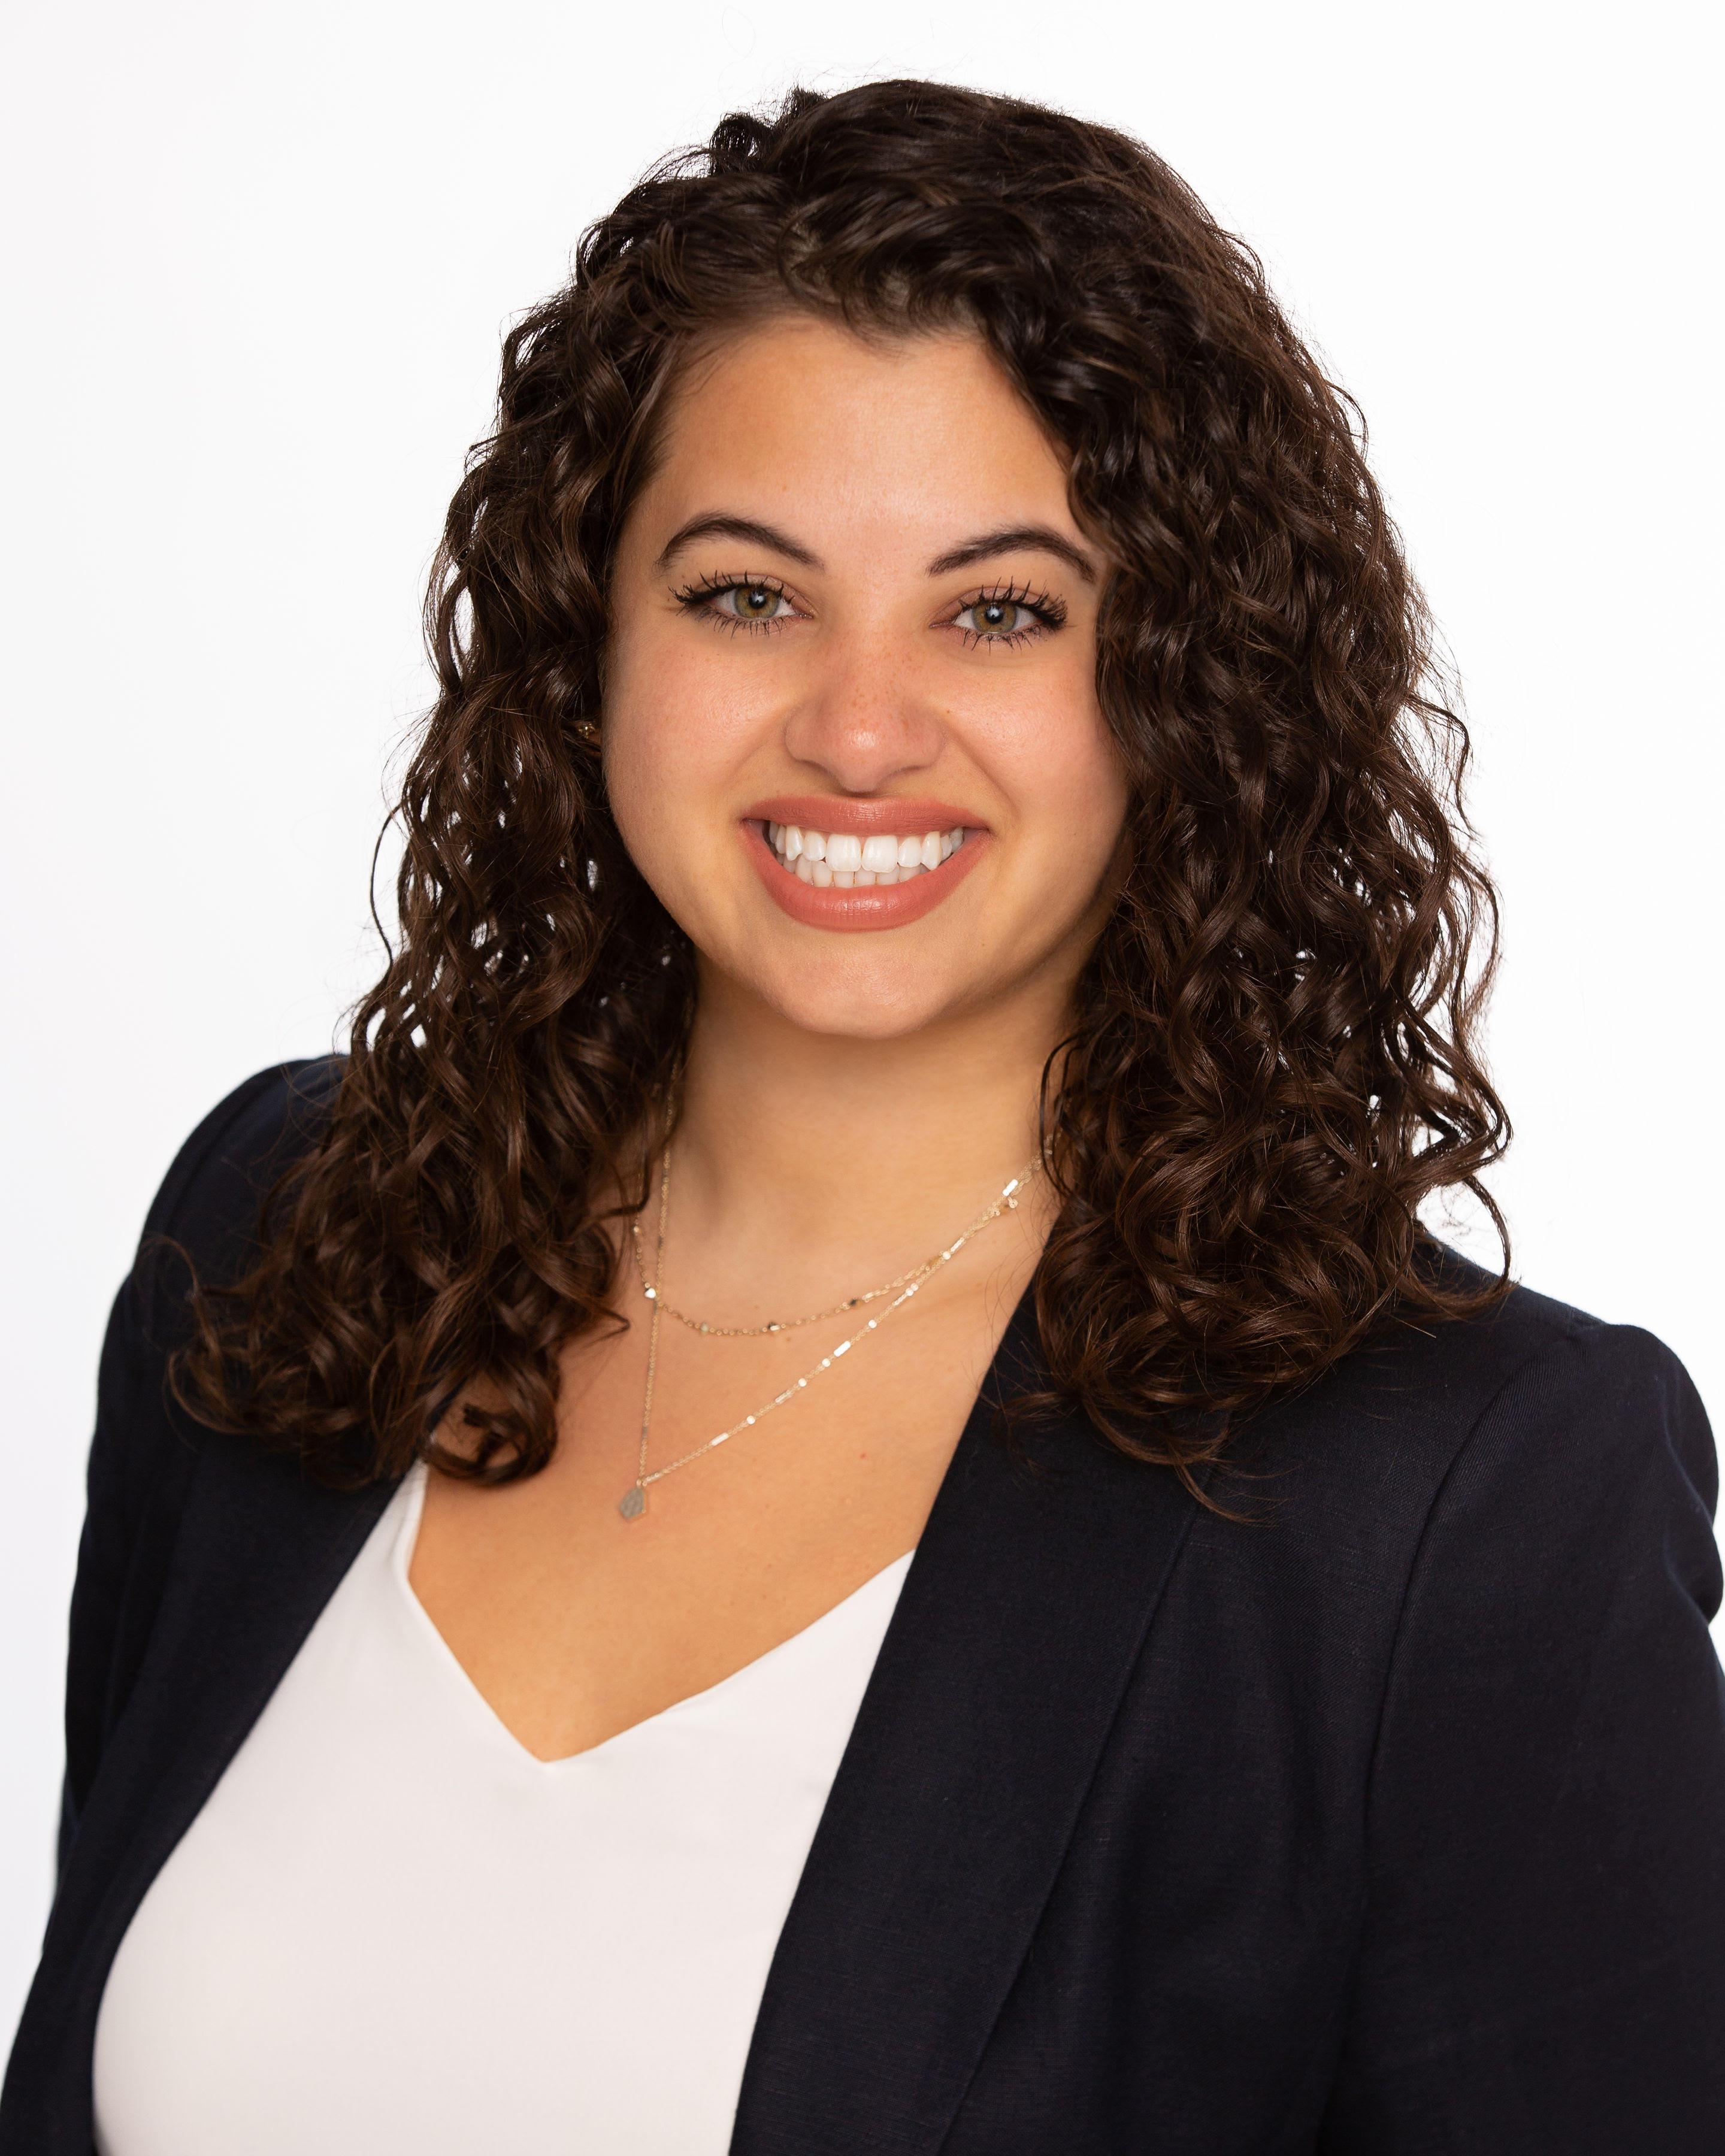 Melissa Atieh